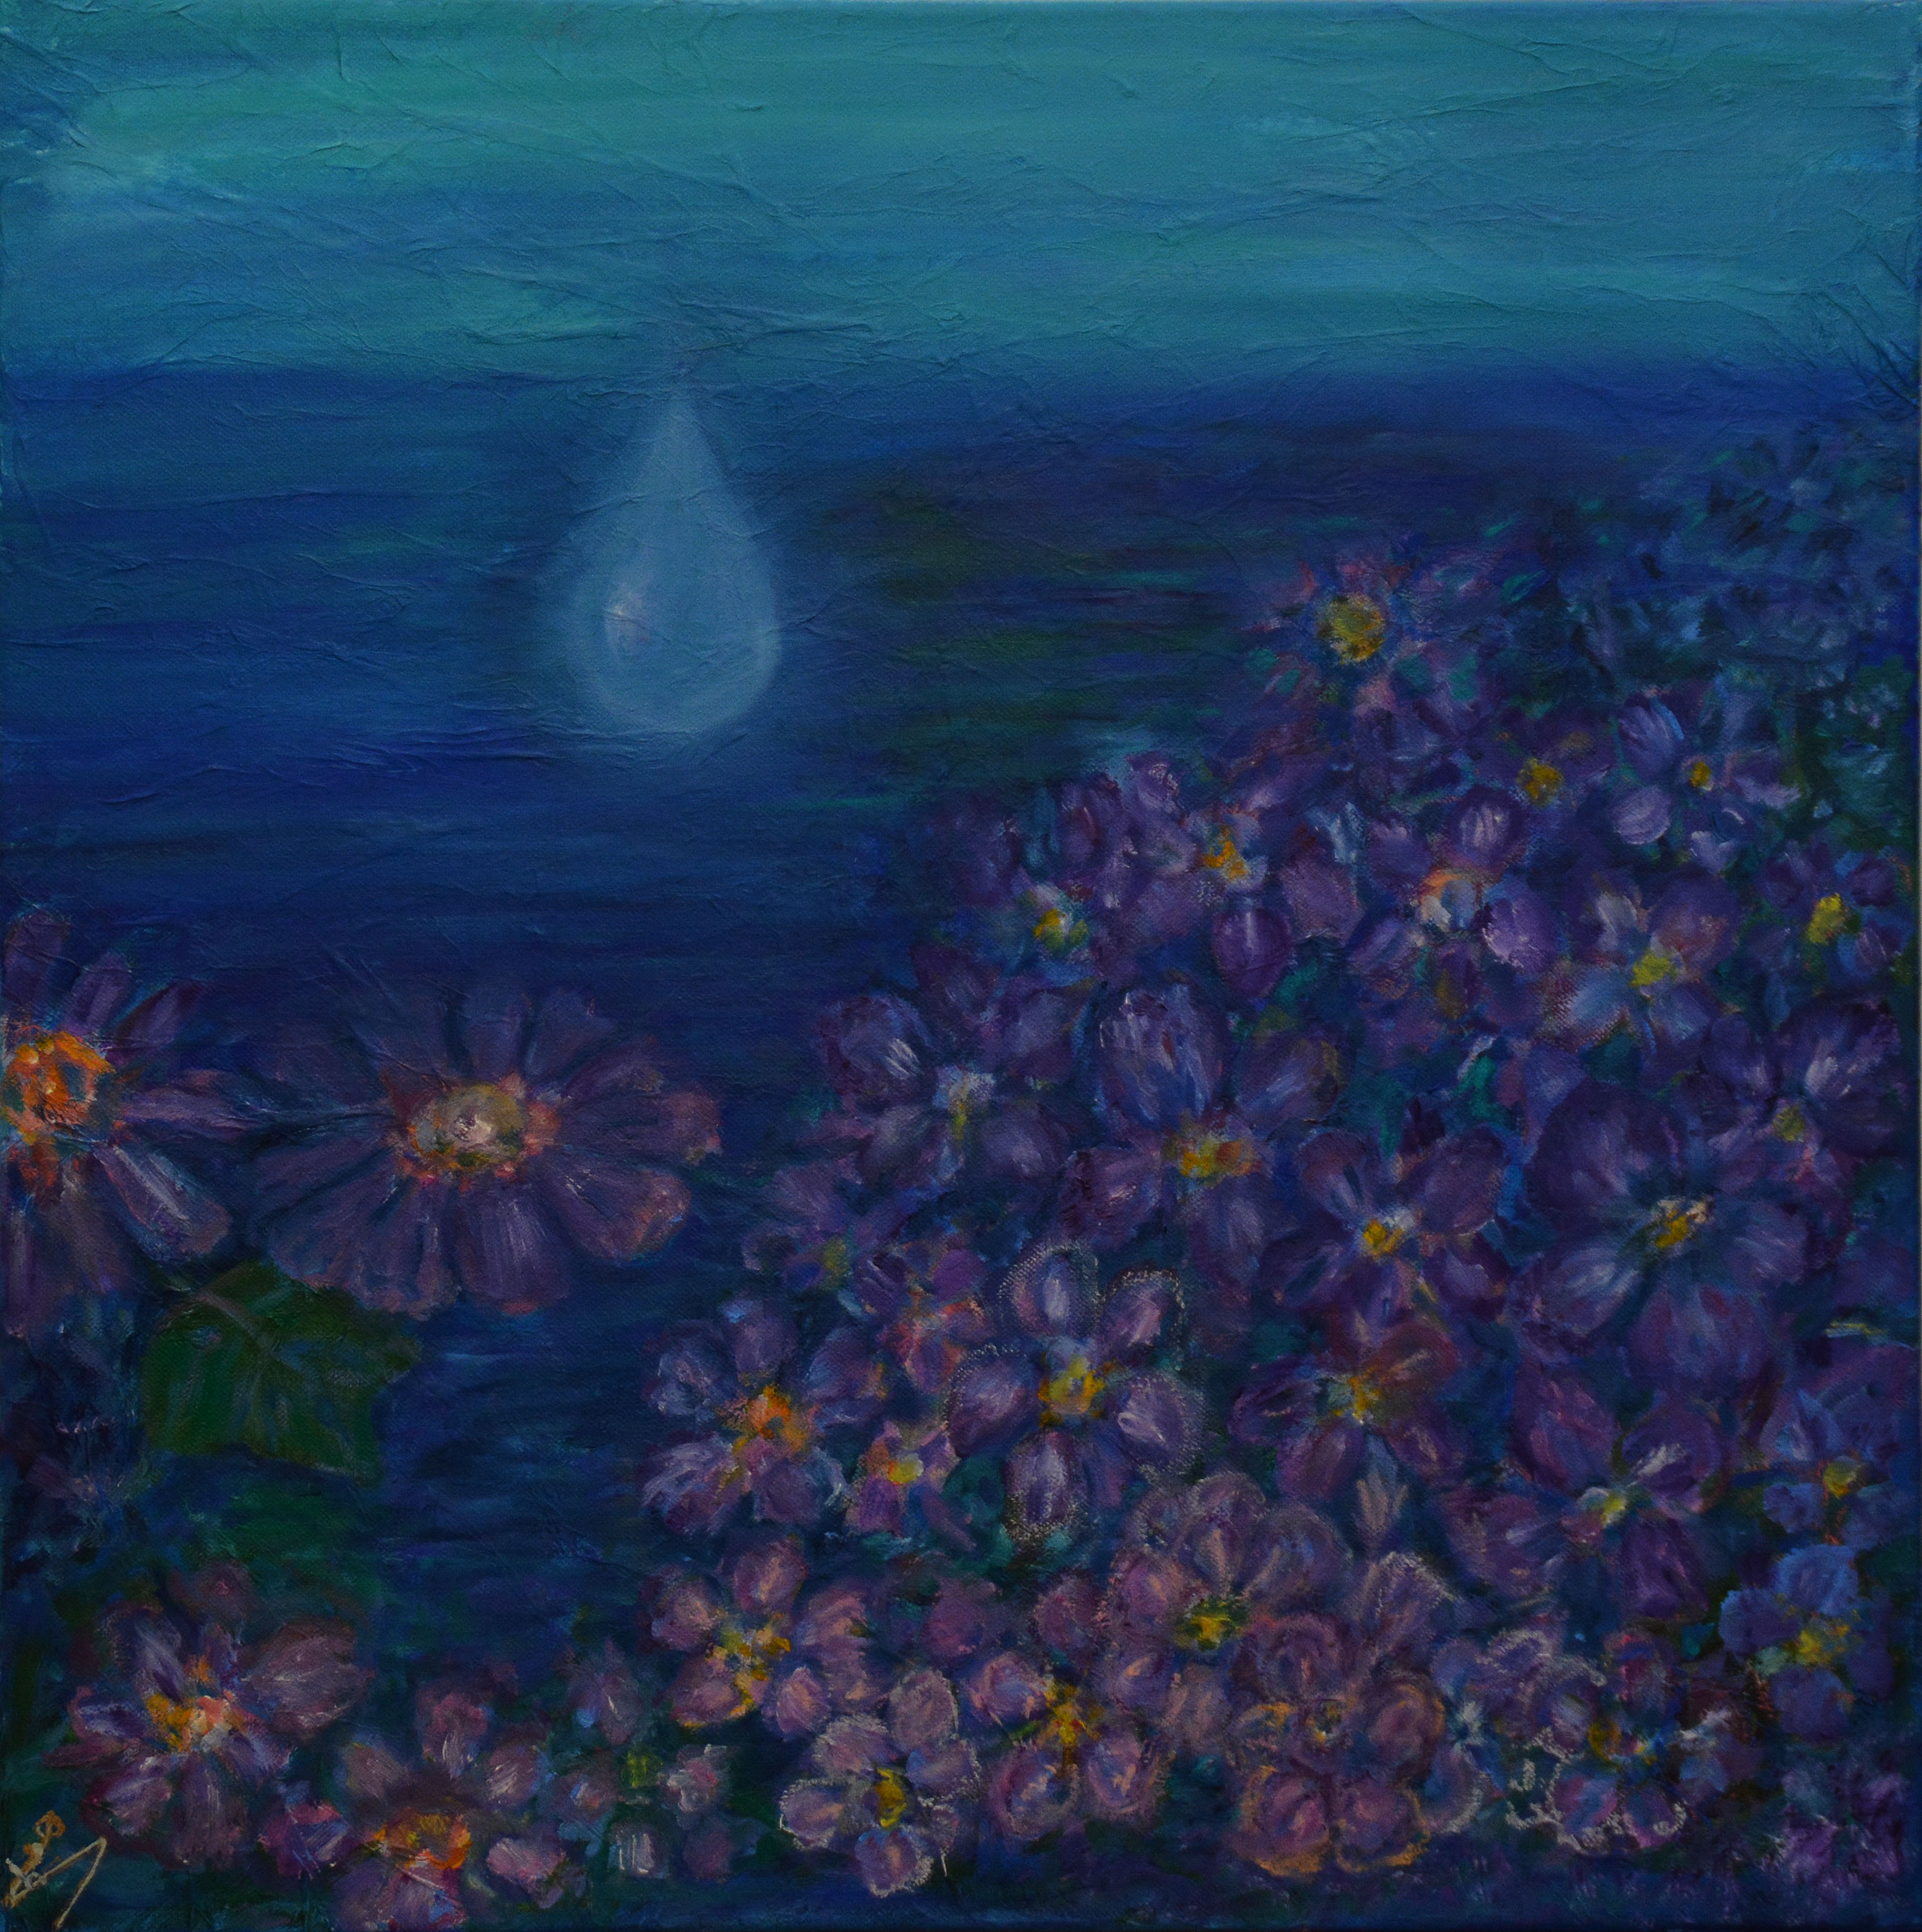 la maree de violettes